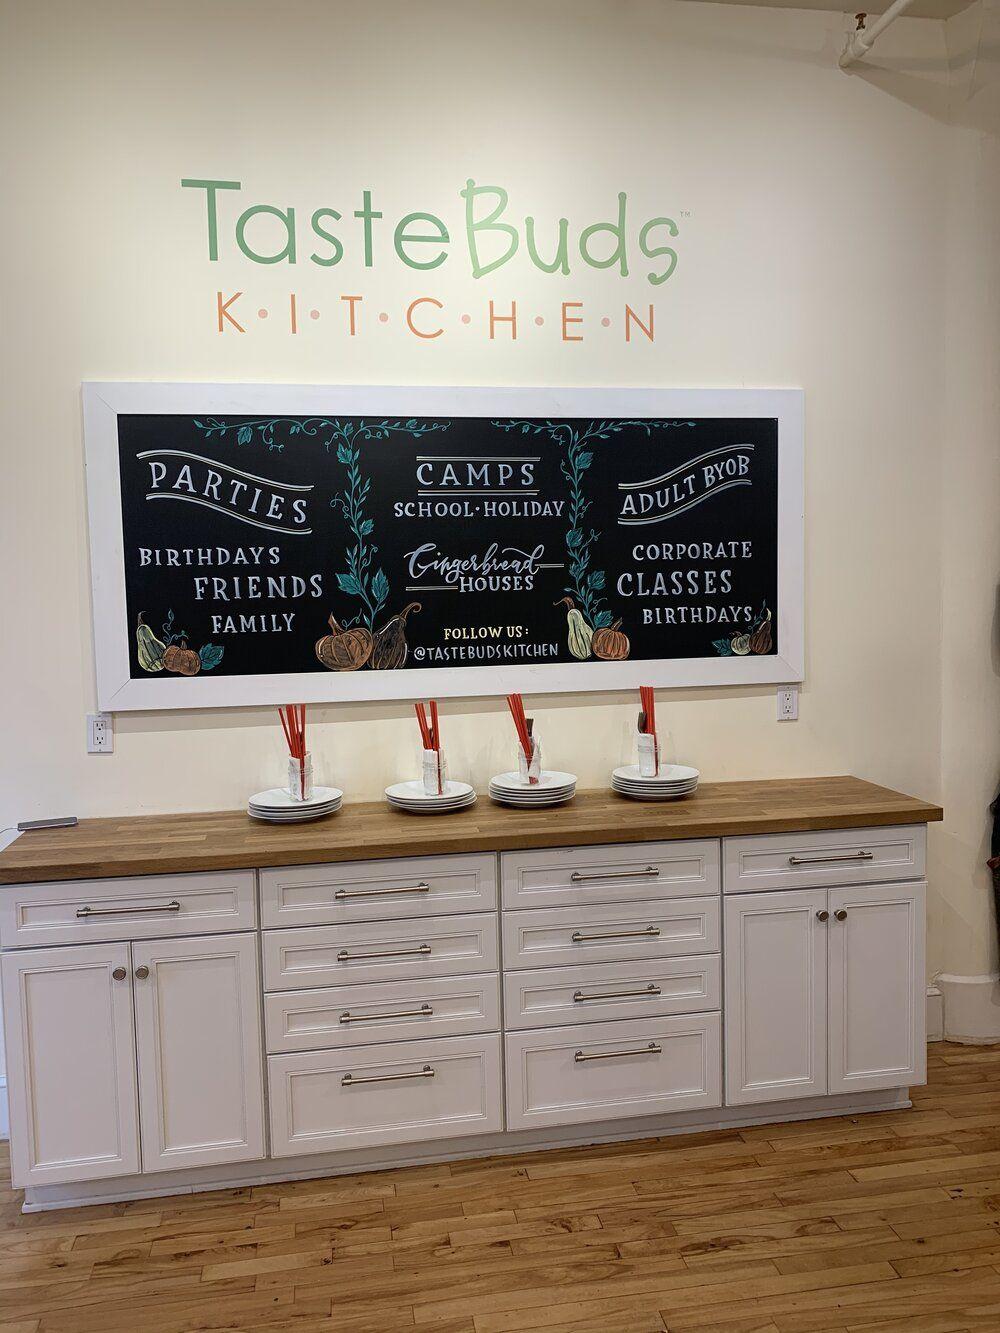 Taste Buds Kitchen Cocktails And Cooking Class Taste Buds